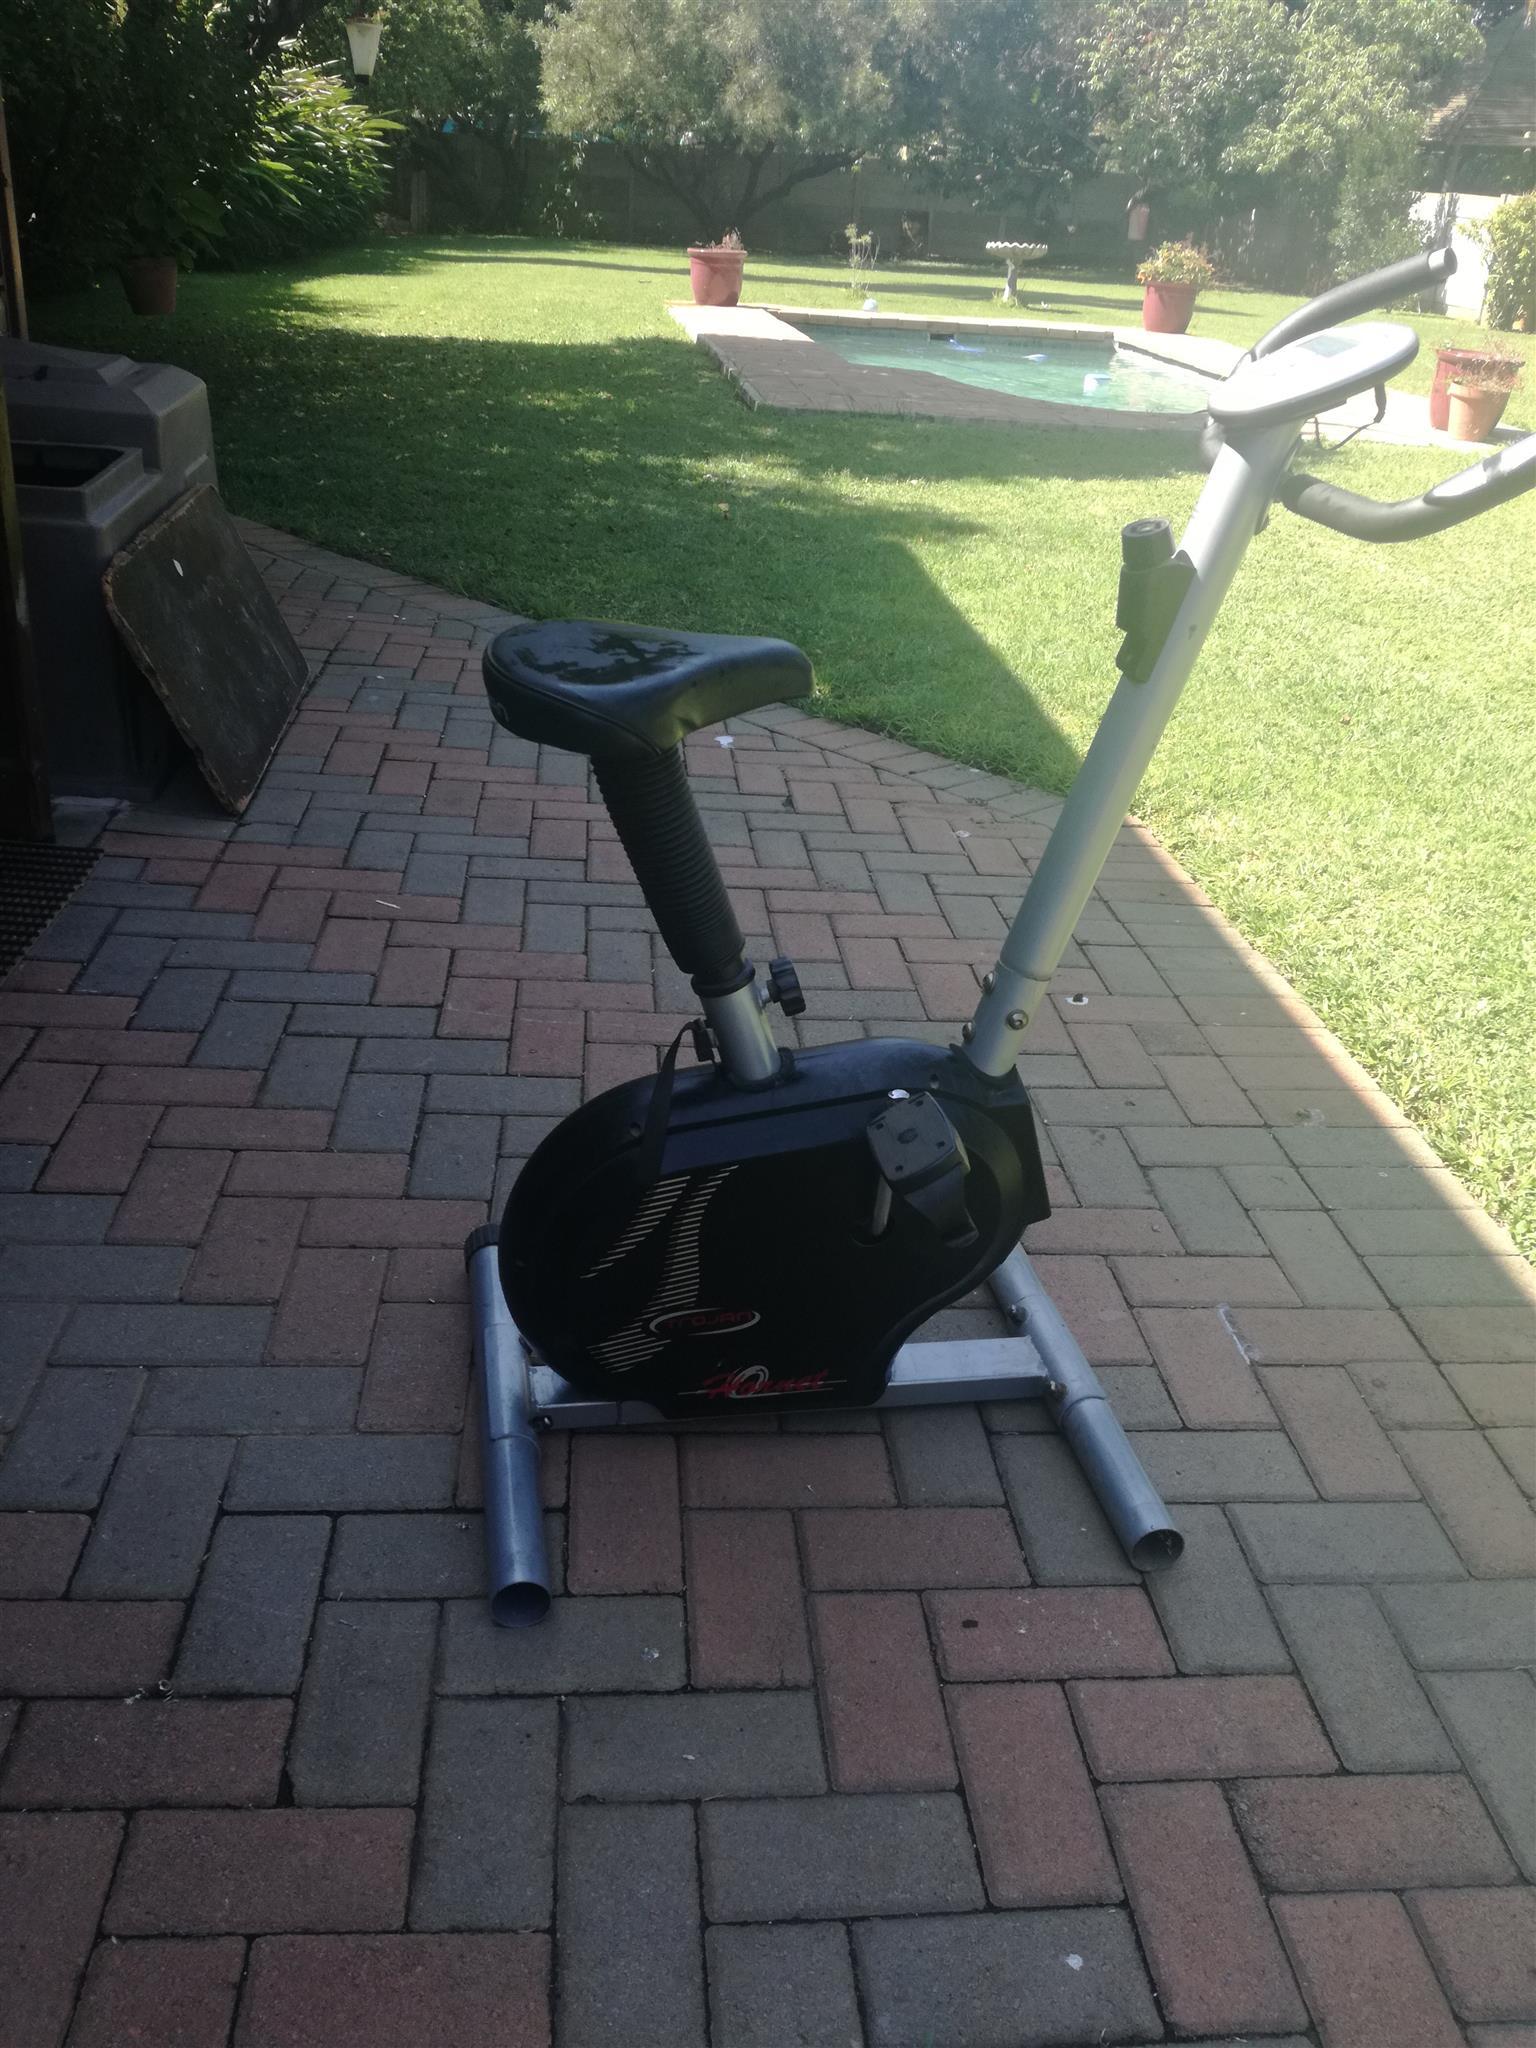 Trojan Exisize bike for sale